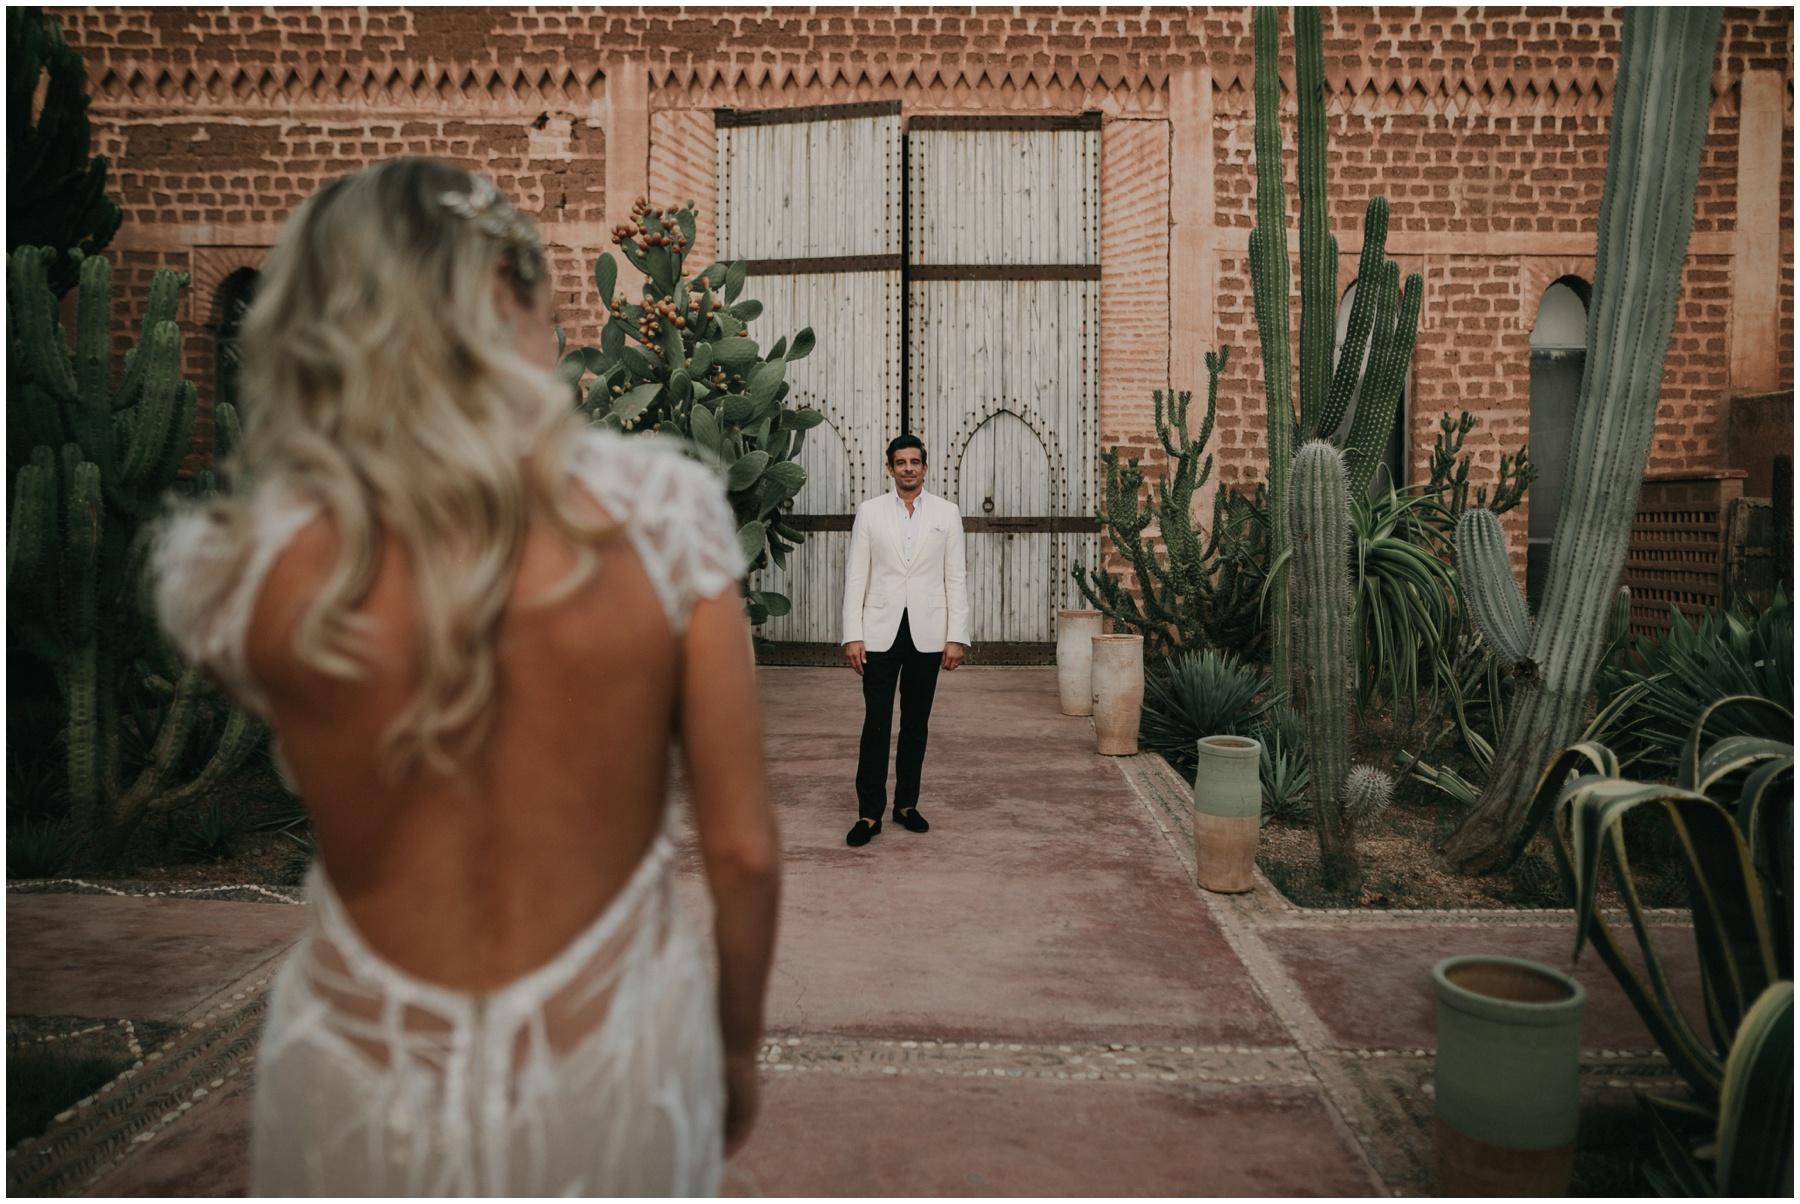 Marrakech Wedding Beldi Coutry Club 064.JPG